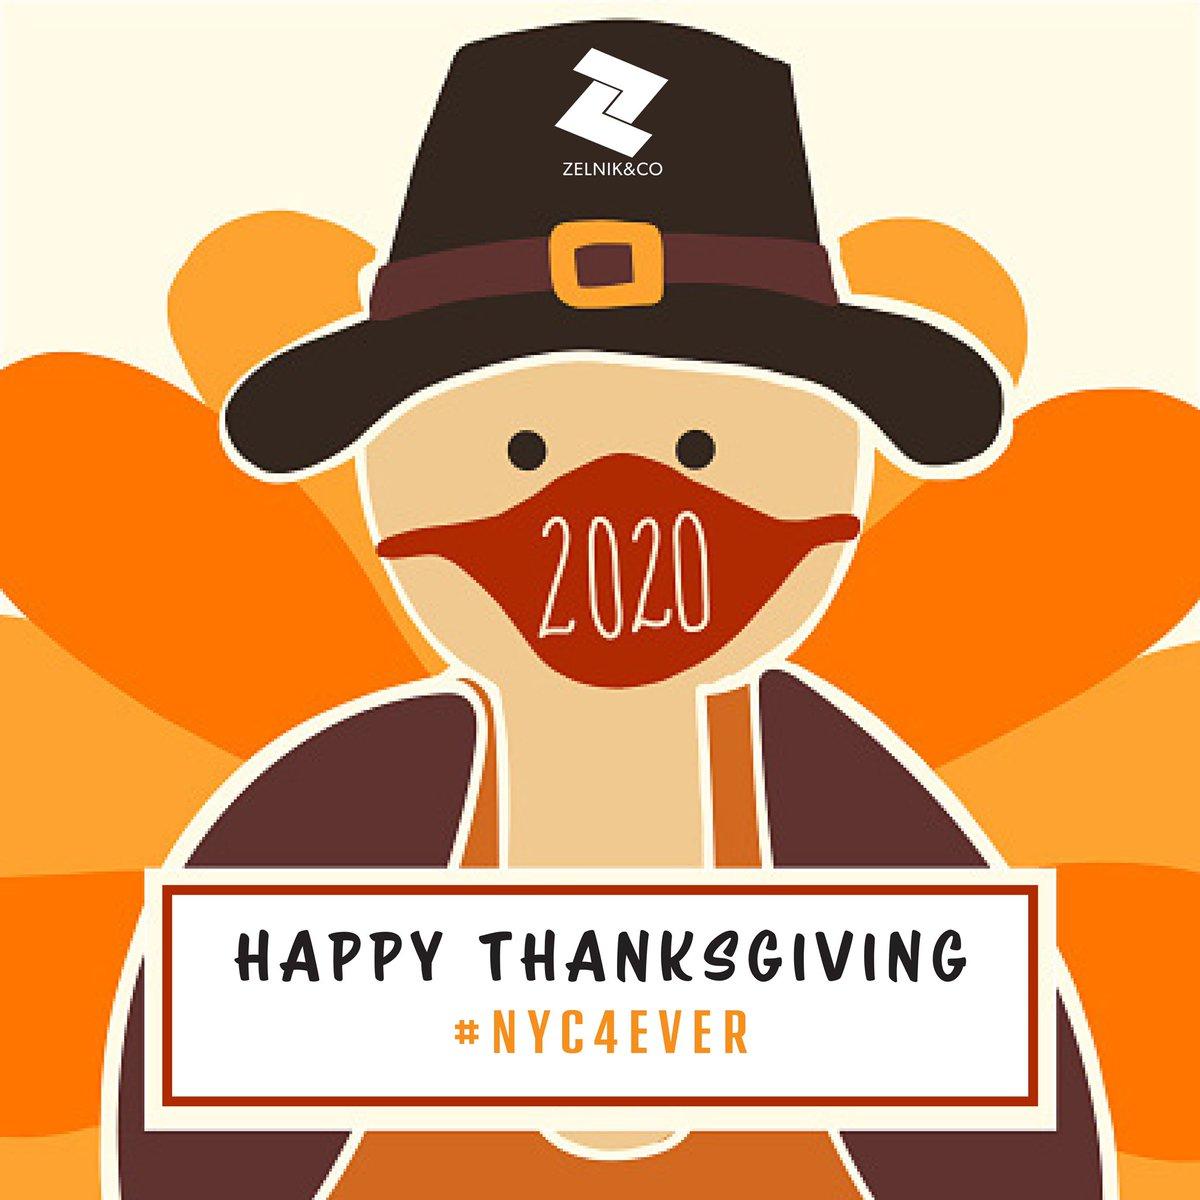 Happy Thanksgiving 🦃🍁  #thanksgiving #happythanksgiving #nyc4ever #nycrealestate #fall #foliage   #newyorkcity #holiday #zelnikco #cre #nyc #turkeyday #realestate #food #maskup #turkey #commercialrealestate #family #friends #thankful #grateful #mask #begratefuleveryday #2020